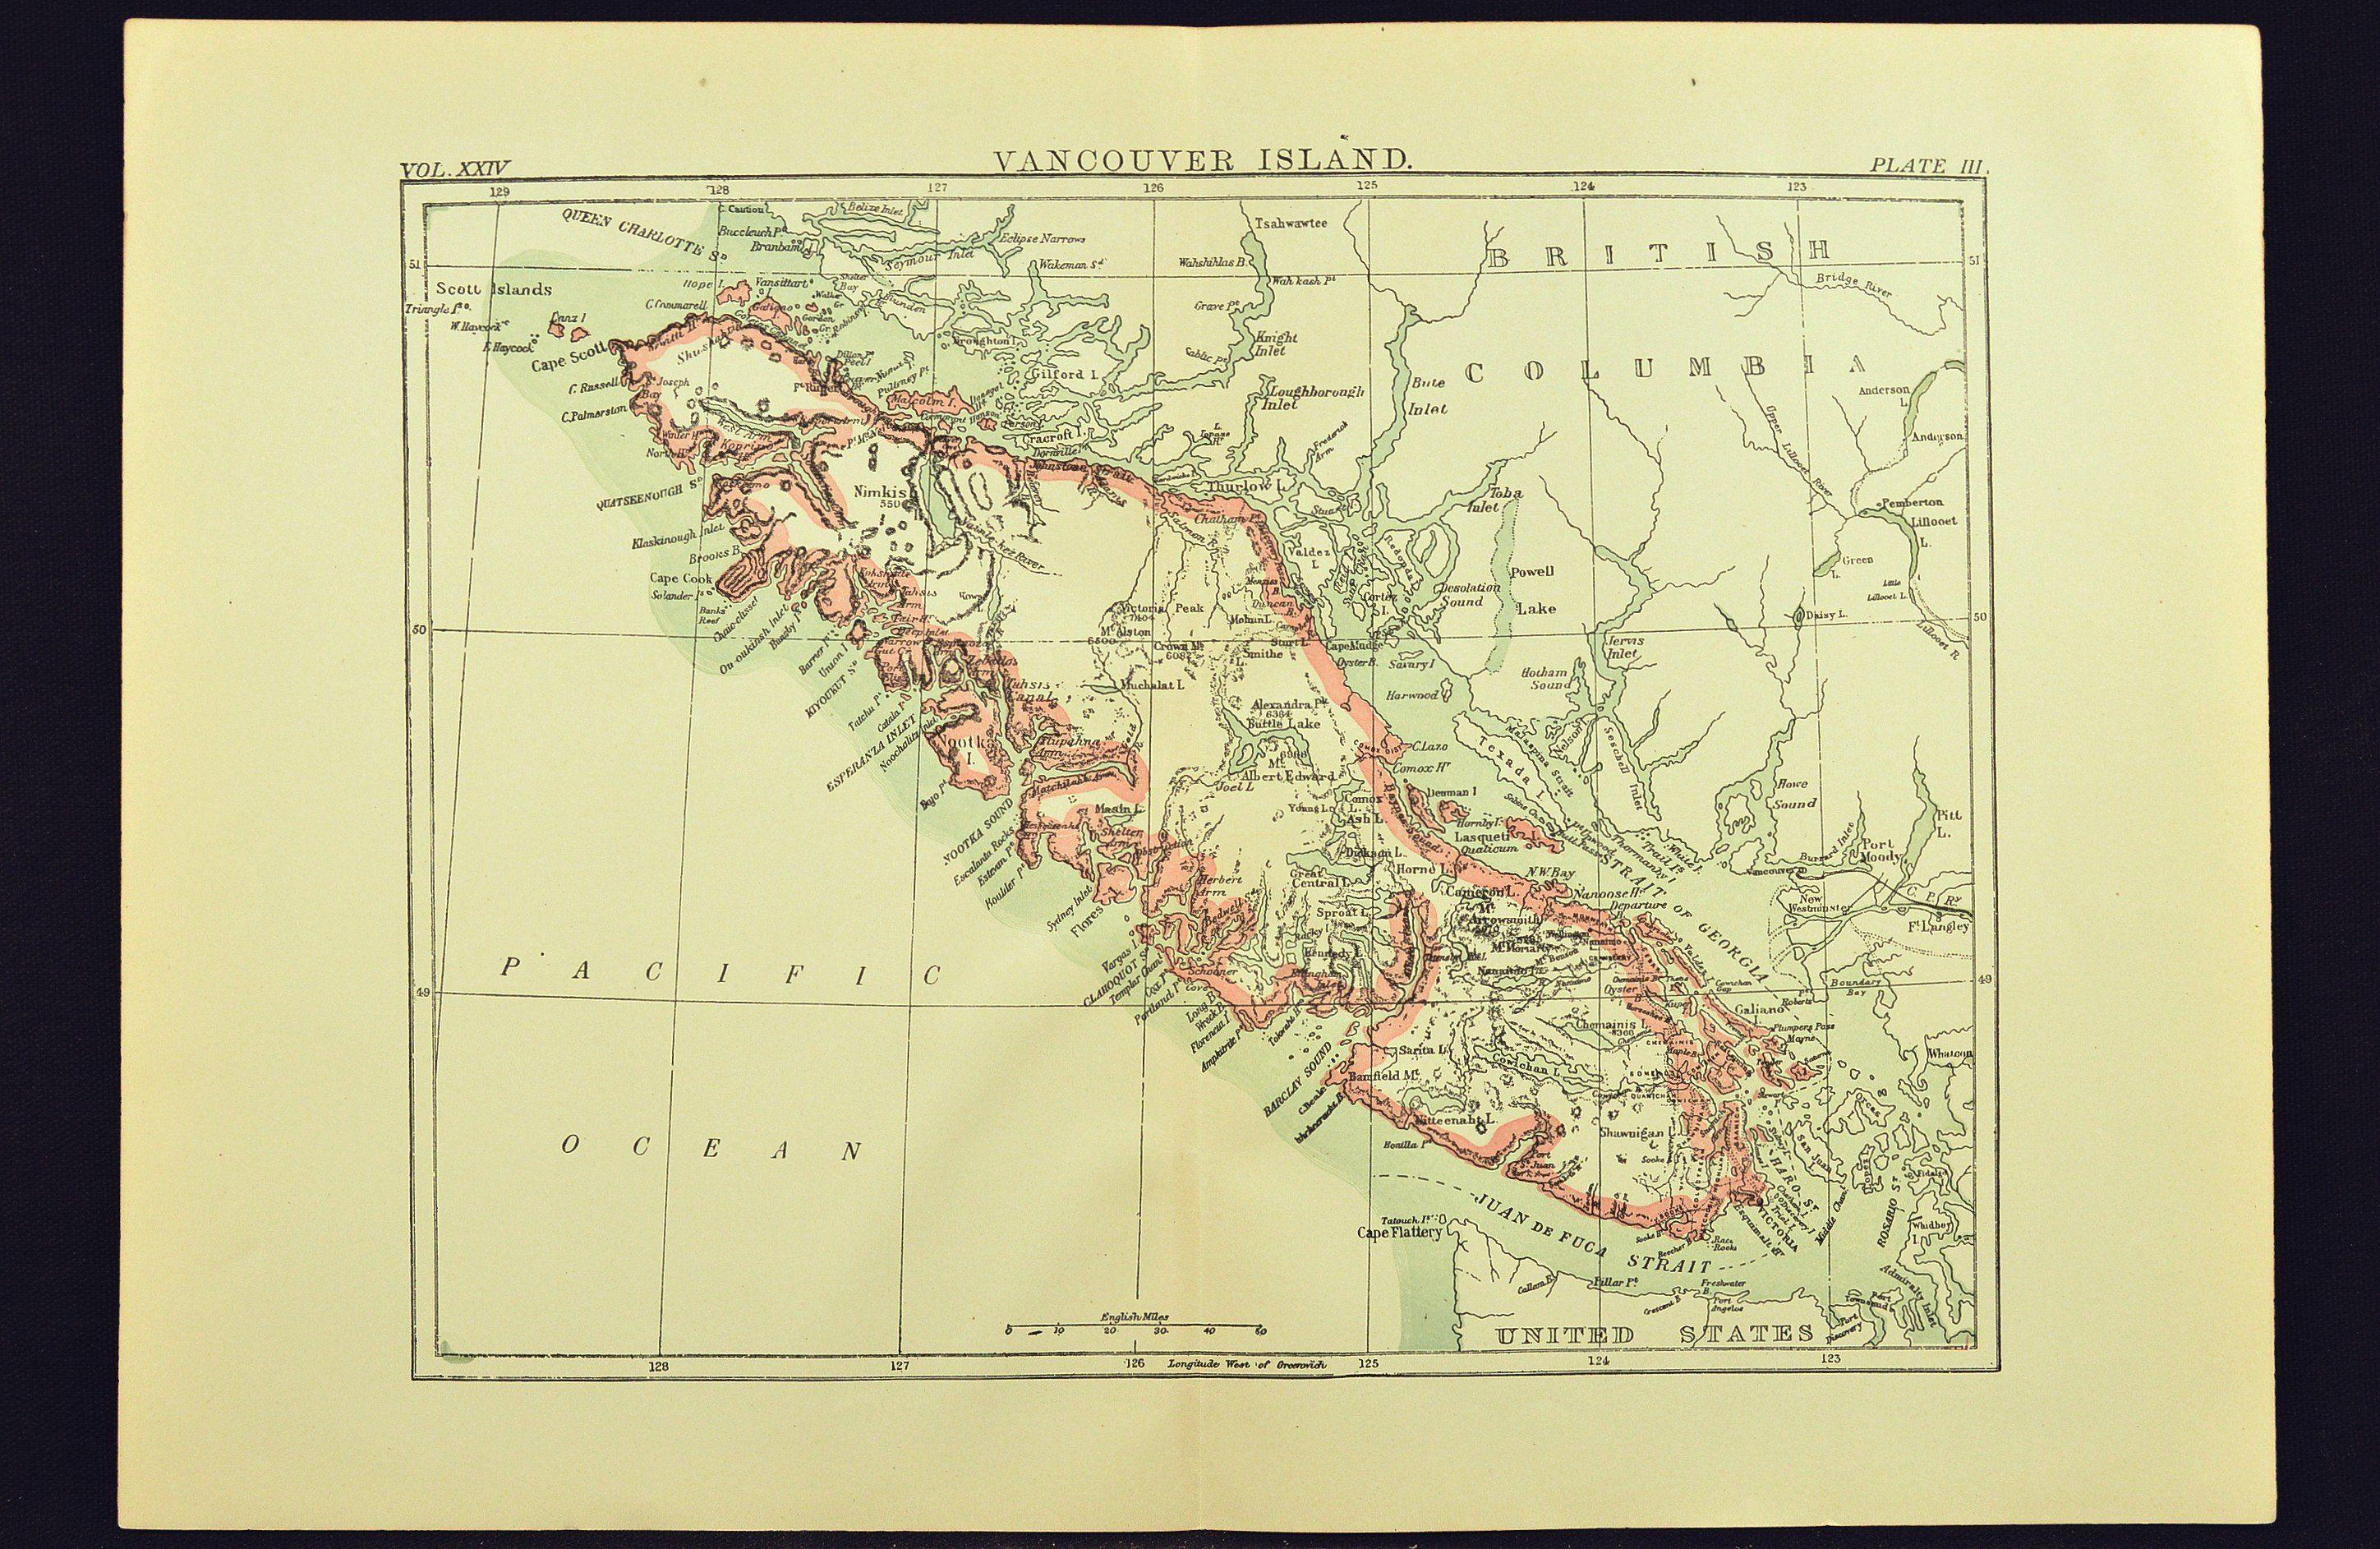 Nanaimo Canada Vintage Map Antique Vancouver Island Map of Vancouver Island British Columbia